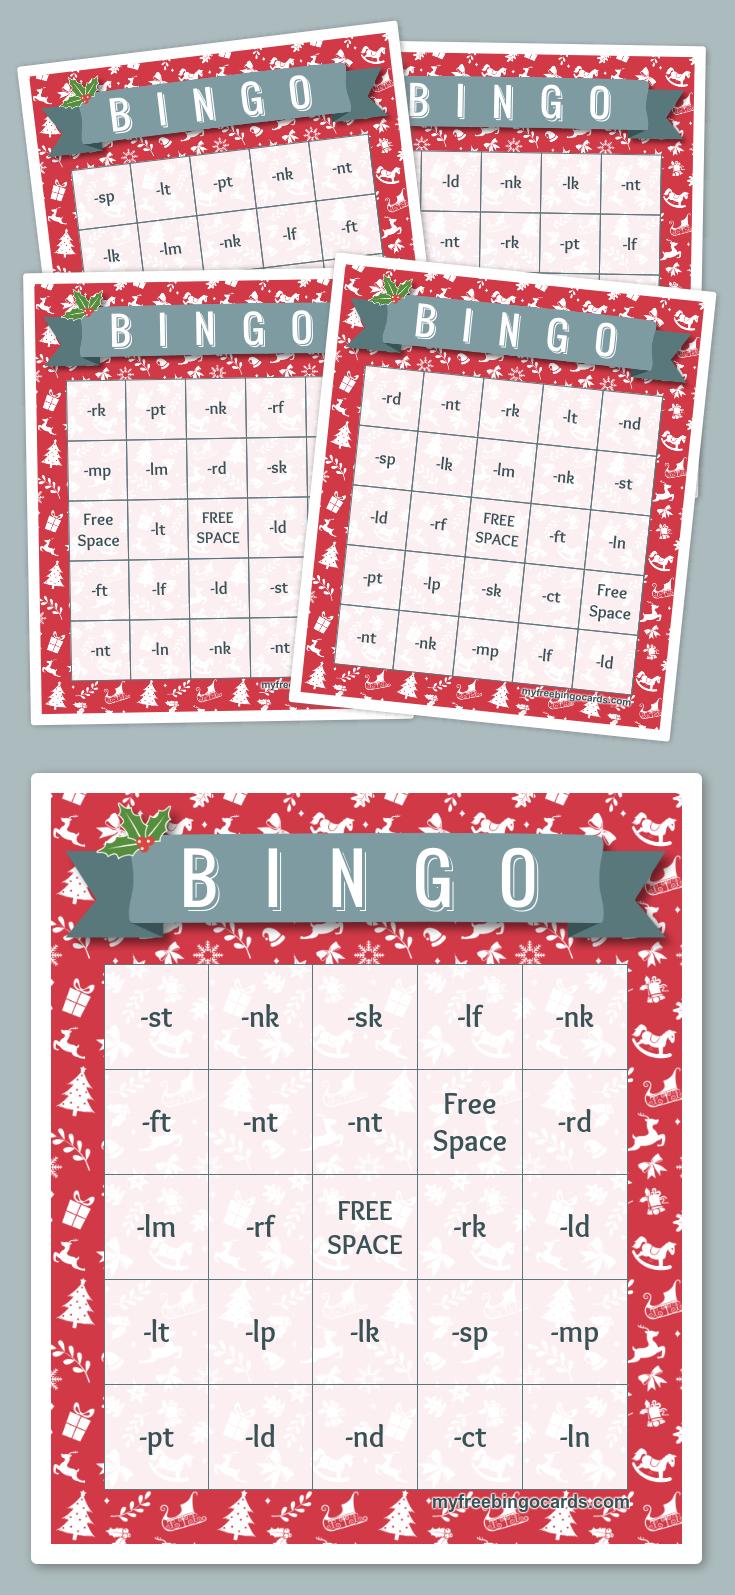 B I N G O Bingo | Christmas Bingo, Free Printable Bingo